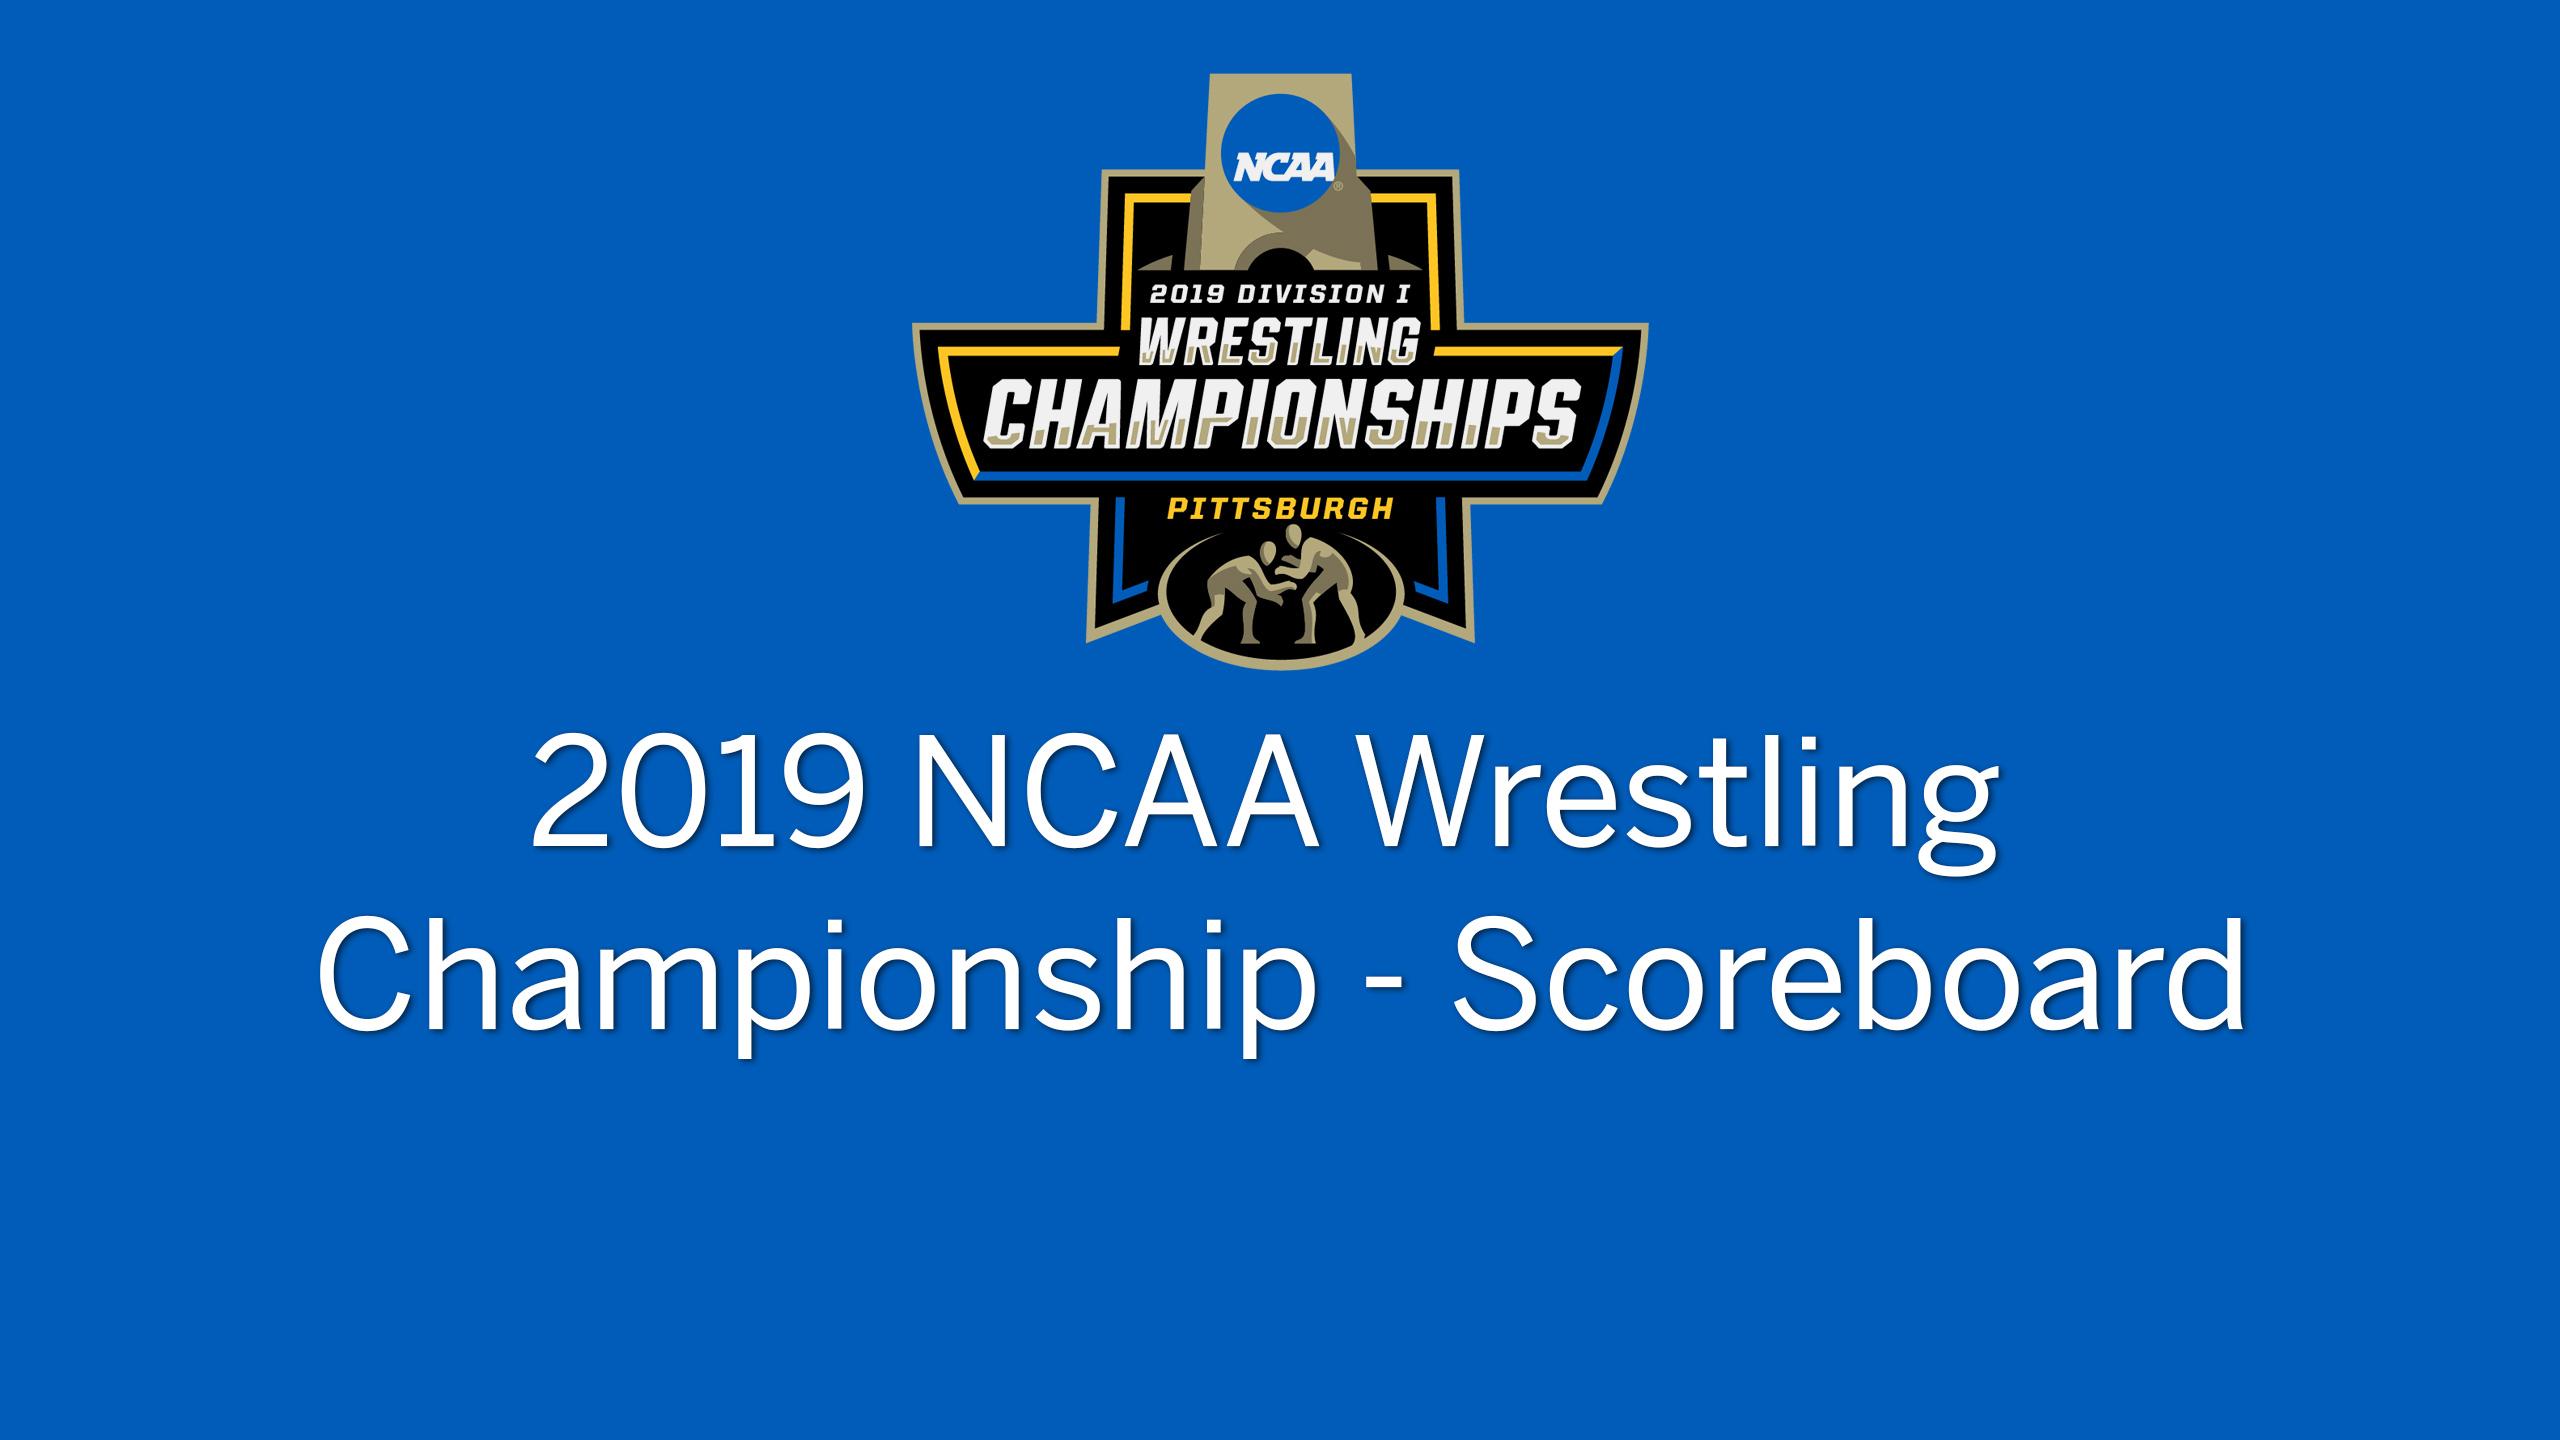 NCAA Wrestling Championship (Scoreboard - Semifinals)